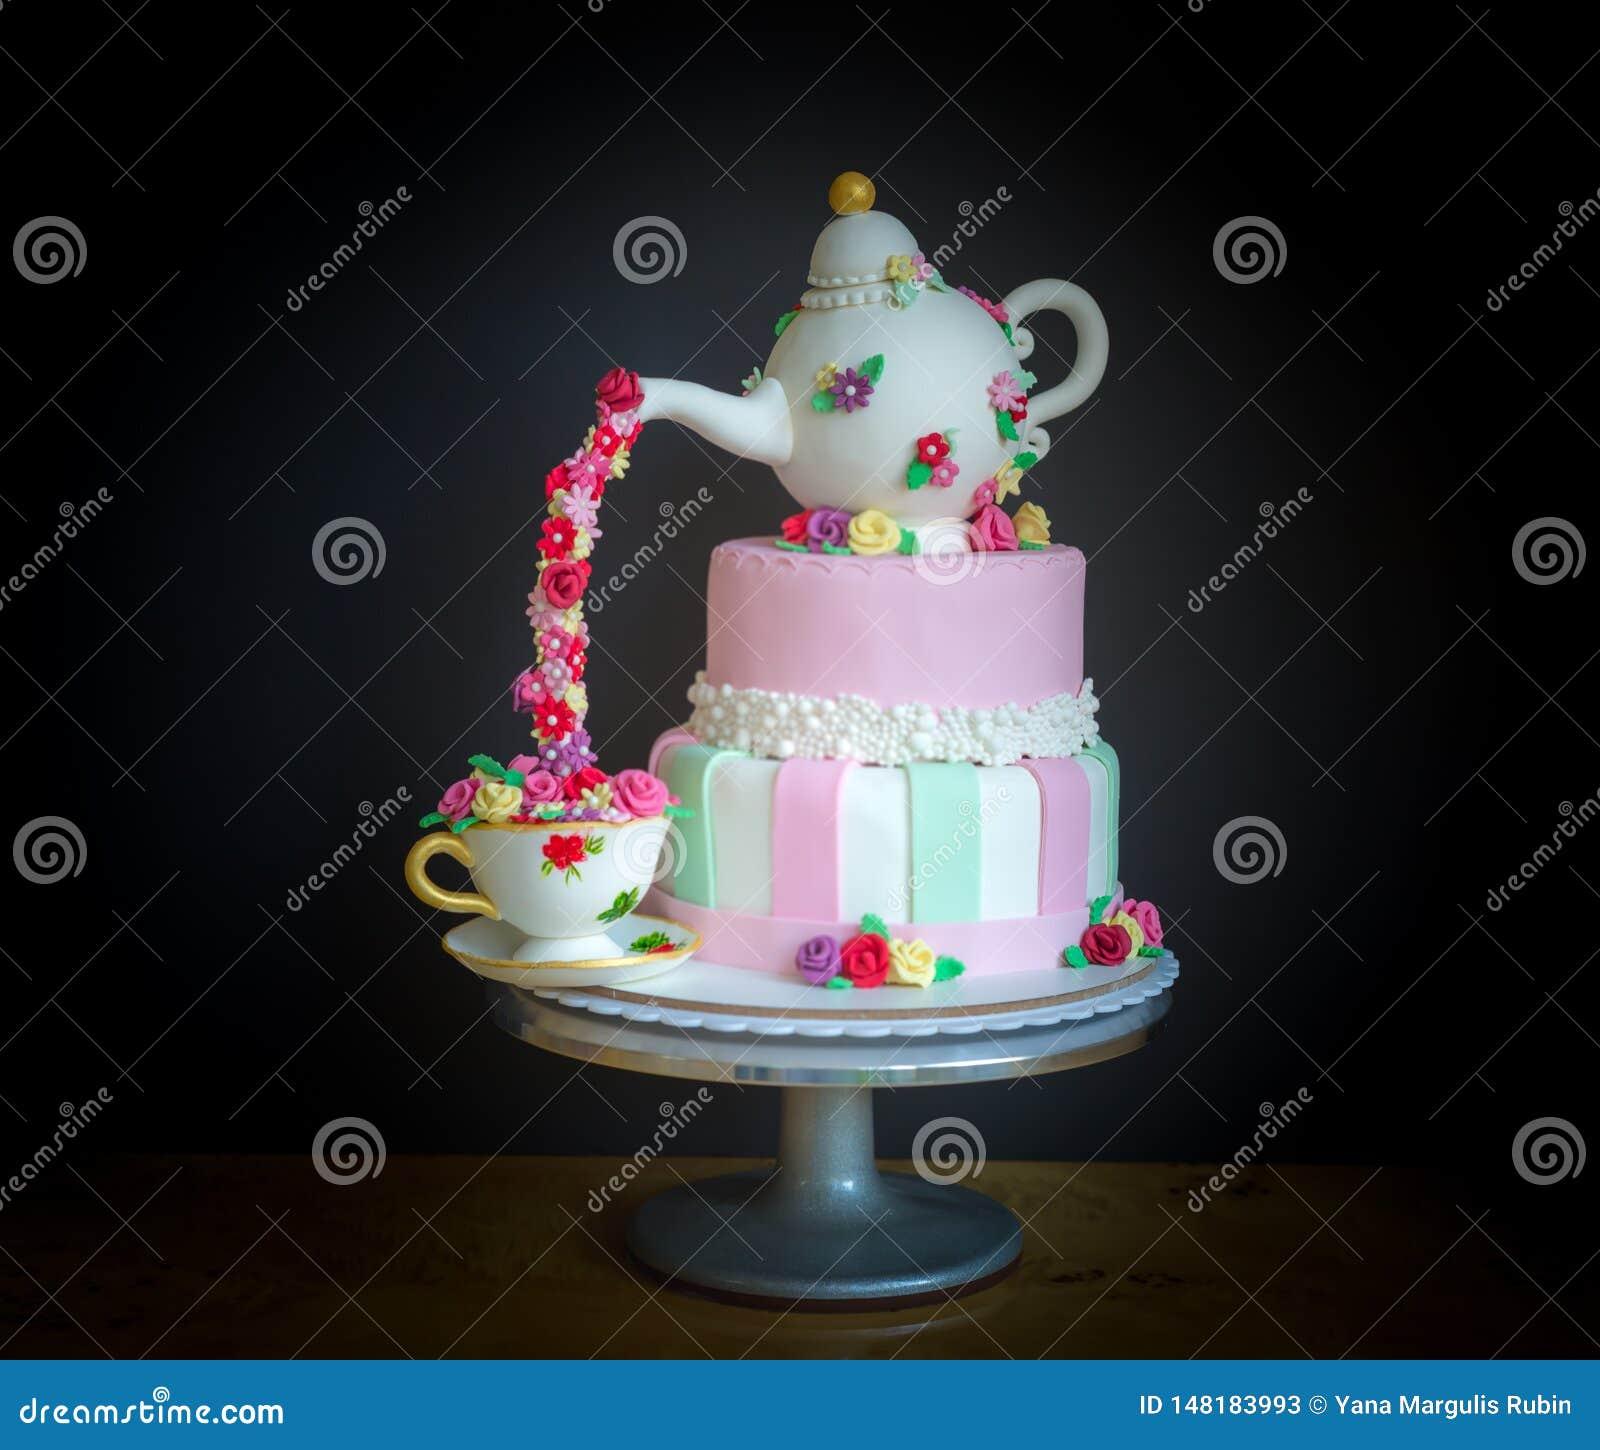 Super Beautiful Birthday Cake Stock Image Image Of Food Dark 148183993 Funny Birthday Cards Online Elaedamsfinfo